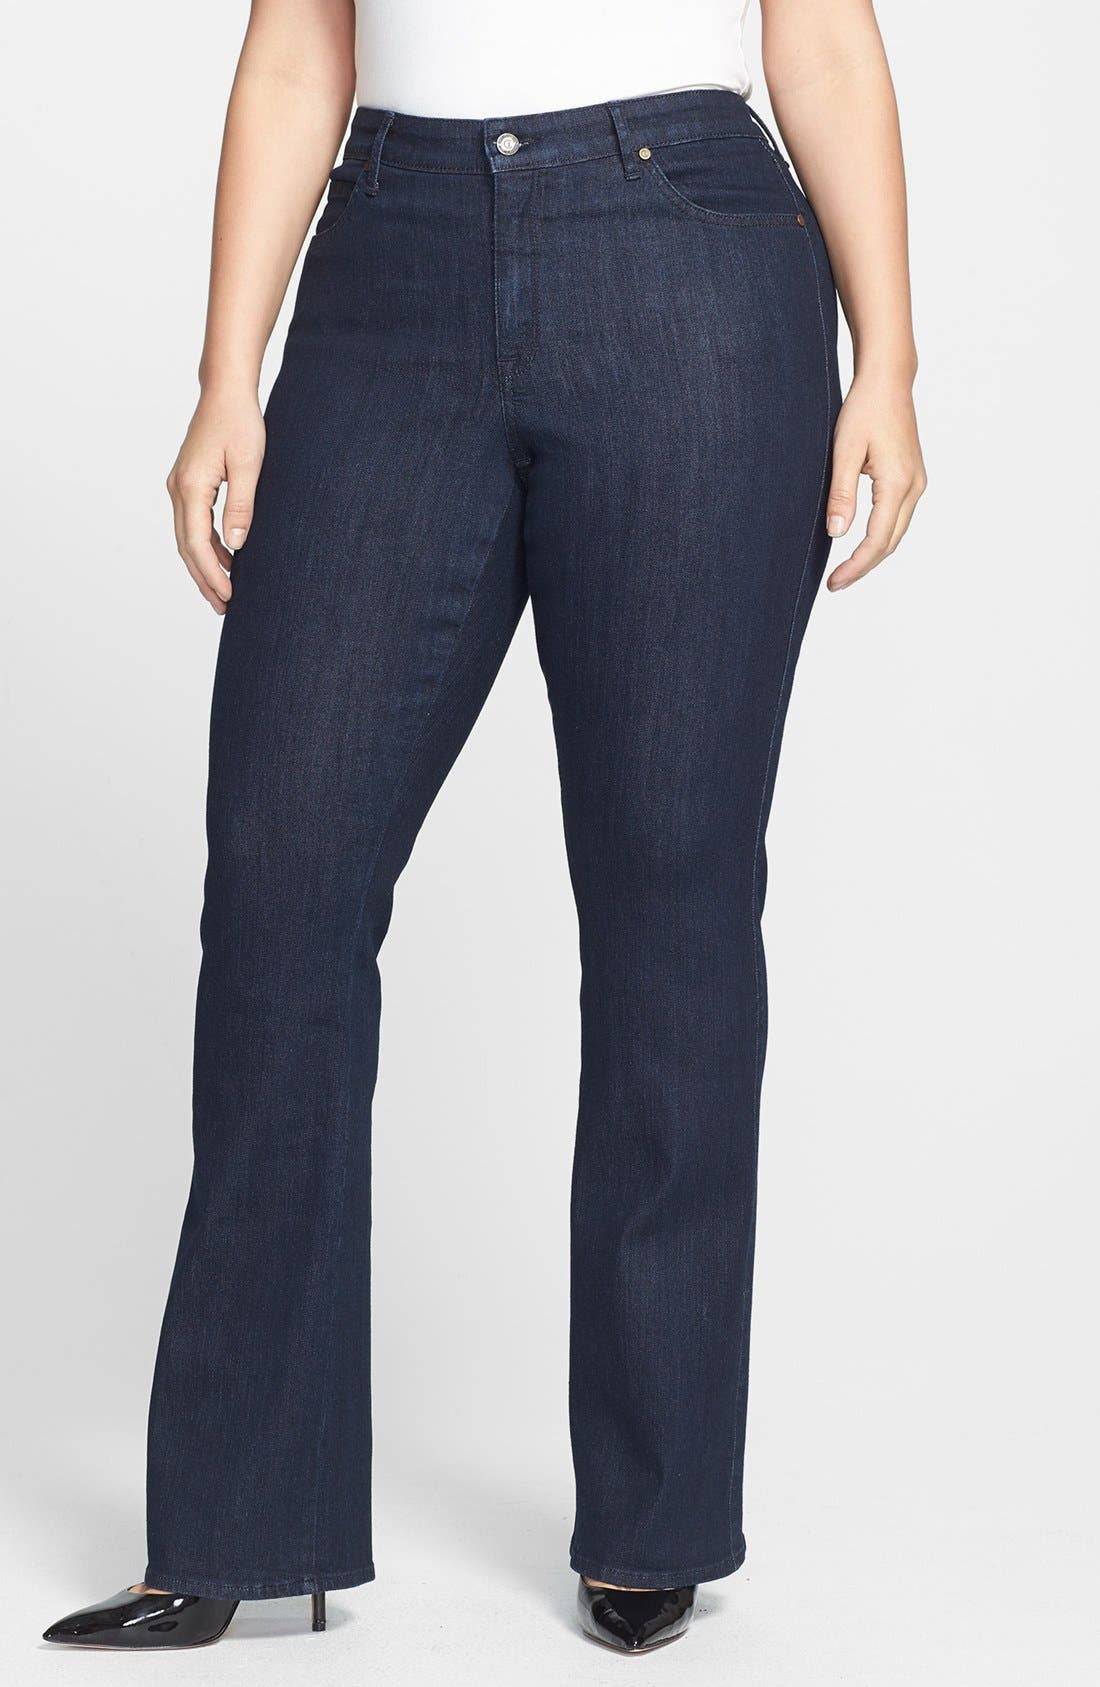 Main Image - CJ by Cookie Johnson 'Grace' Bootcut Stretch Jeans (Plus Size)